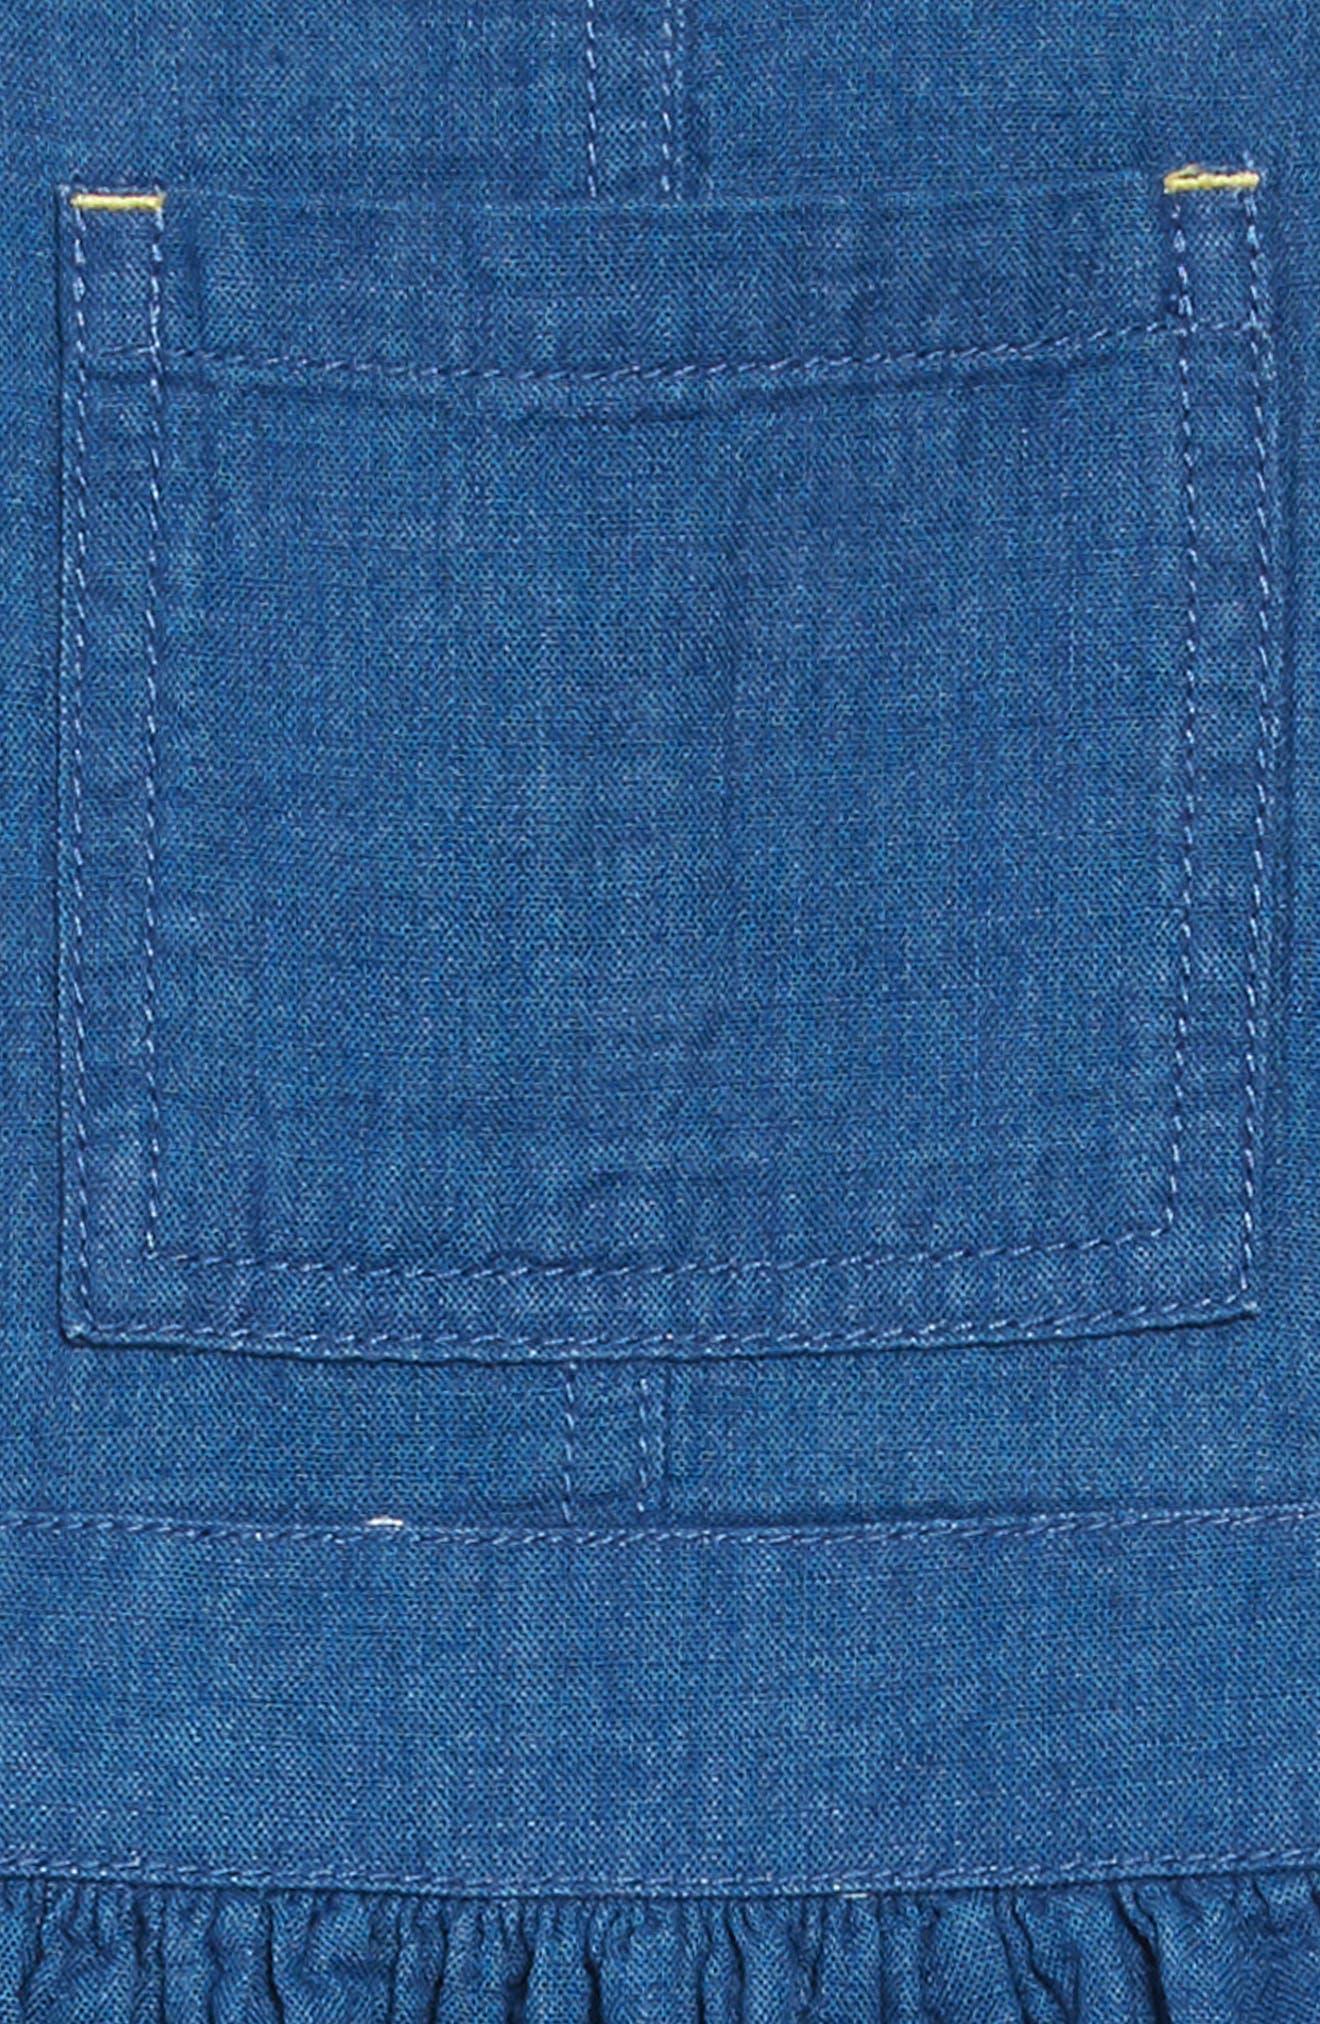 Dungaree Overall Dress,                             Alternate thumbnail 3, color,                             INDIGO BLUE